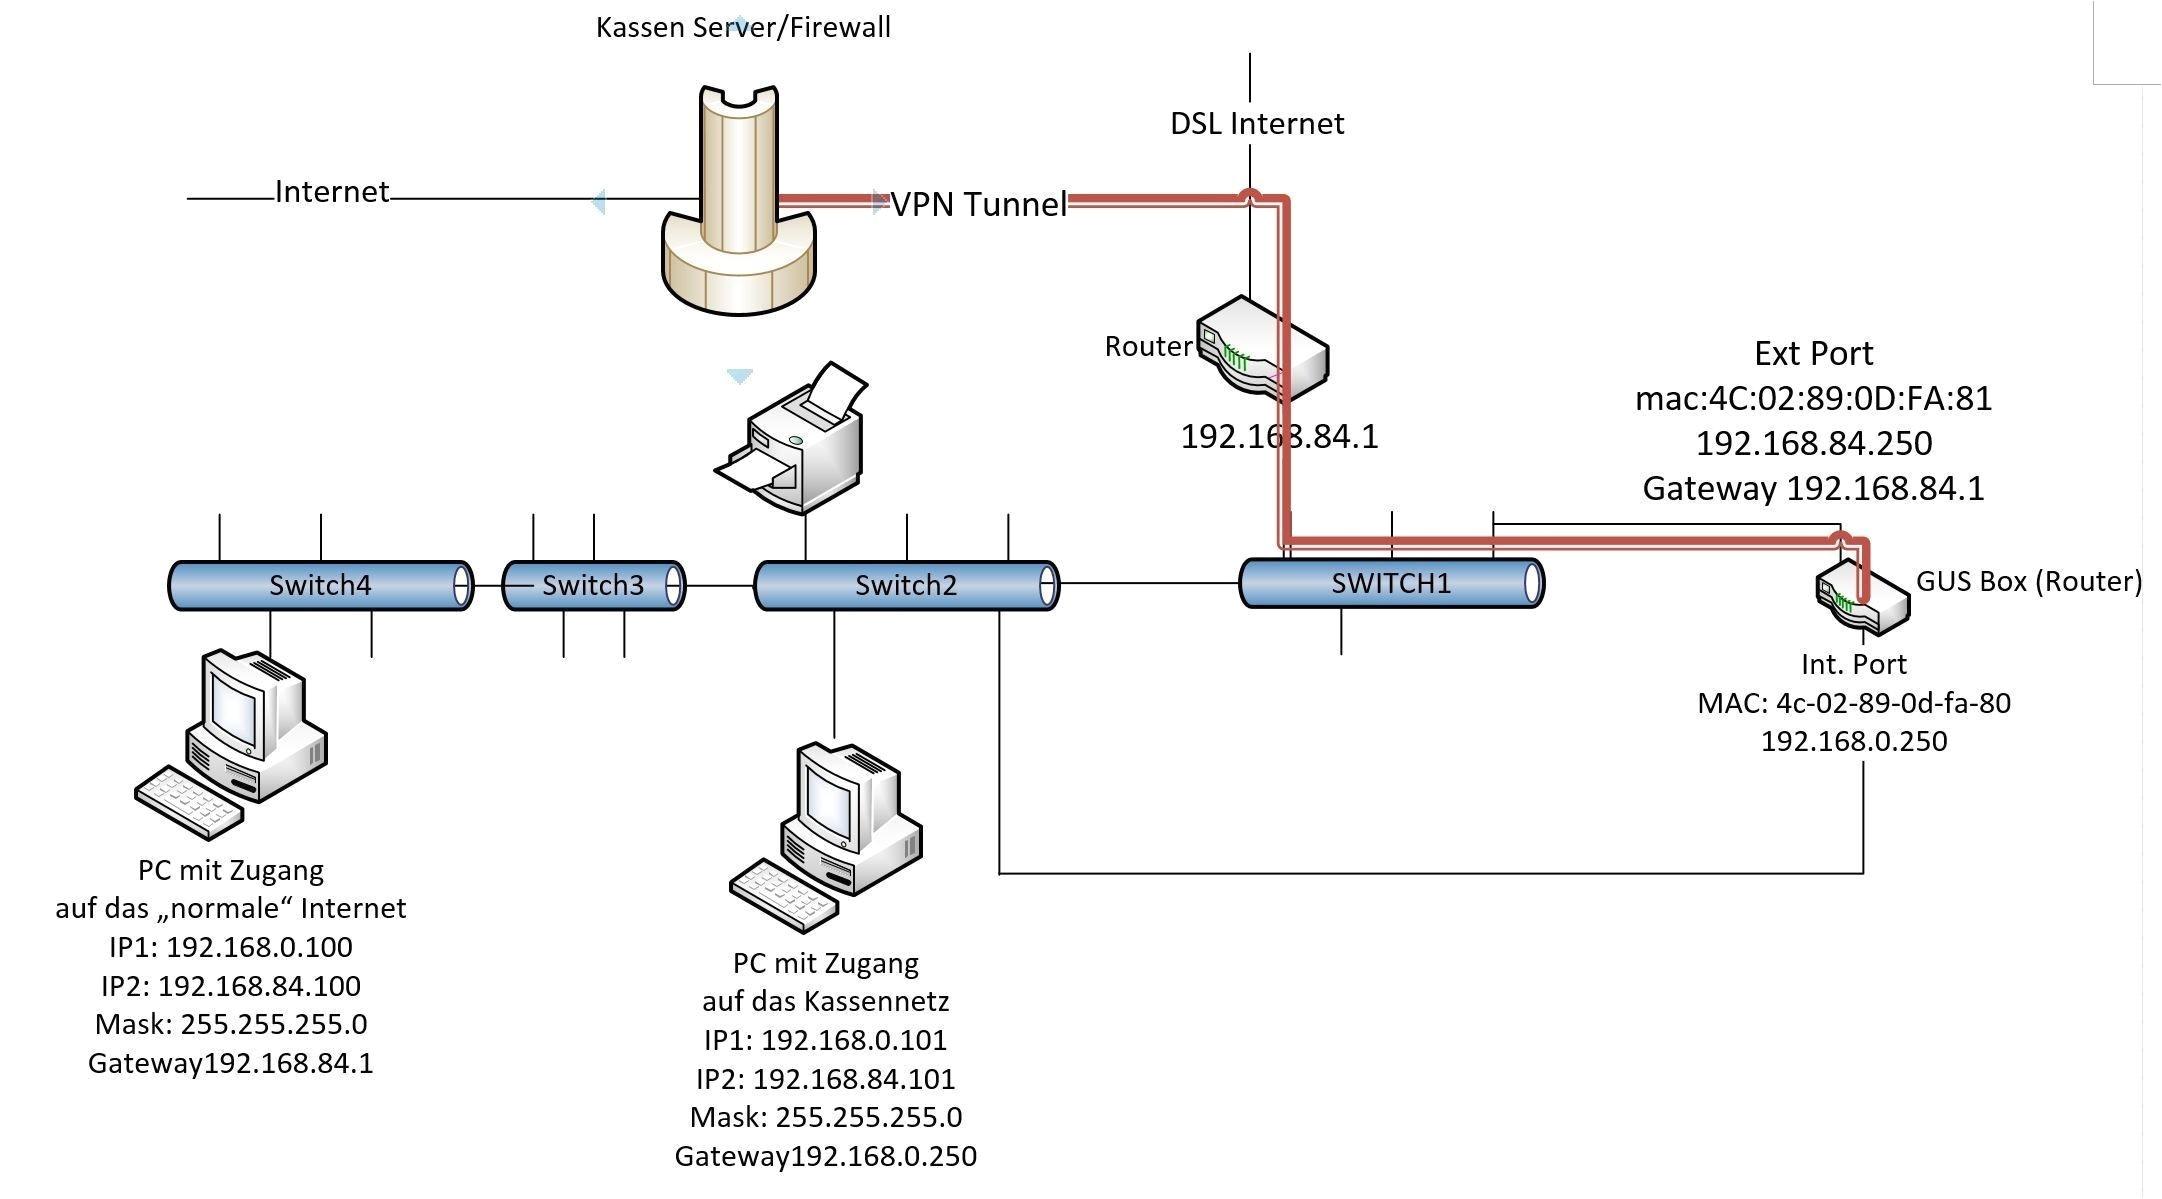 fender squier p bass wiring diagram unique fender jaguar guitar wiring diagram basic wiring diagram e280a2 jpg